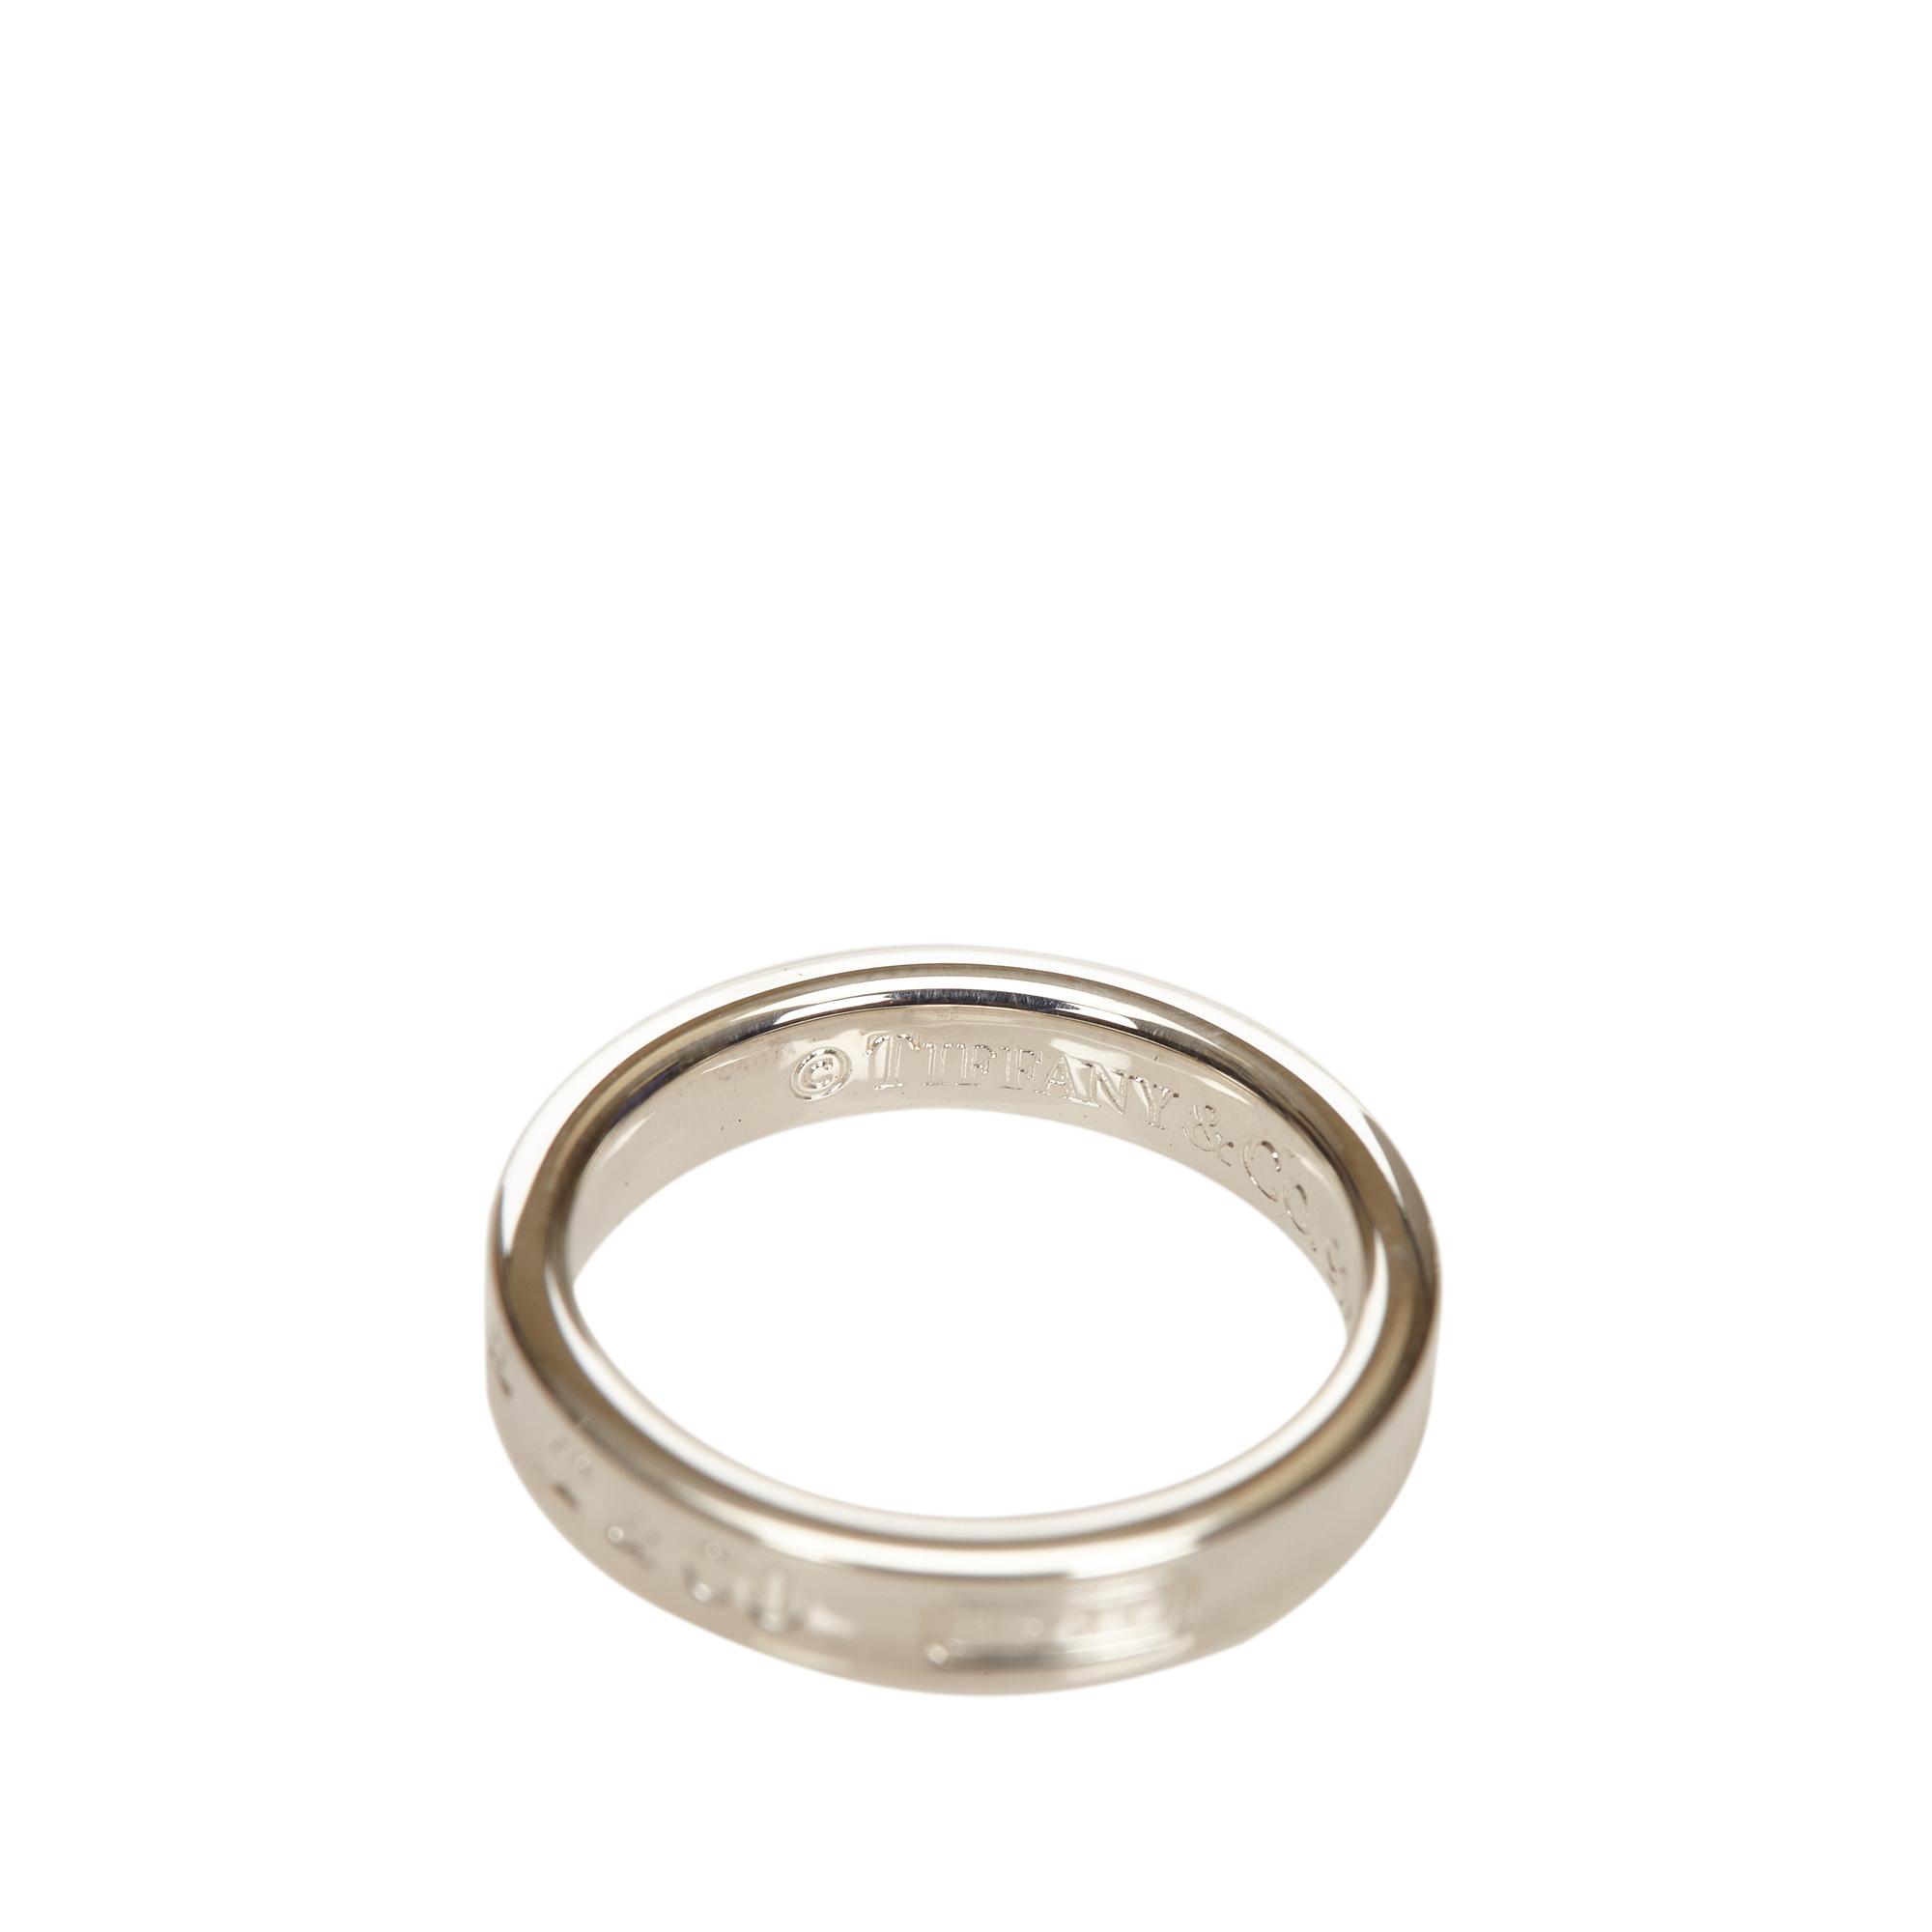 Tiffany & Co. Tiffany 1837 Silver Ring Size 54